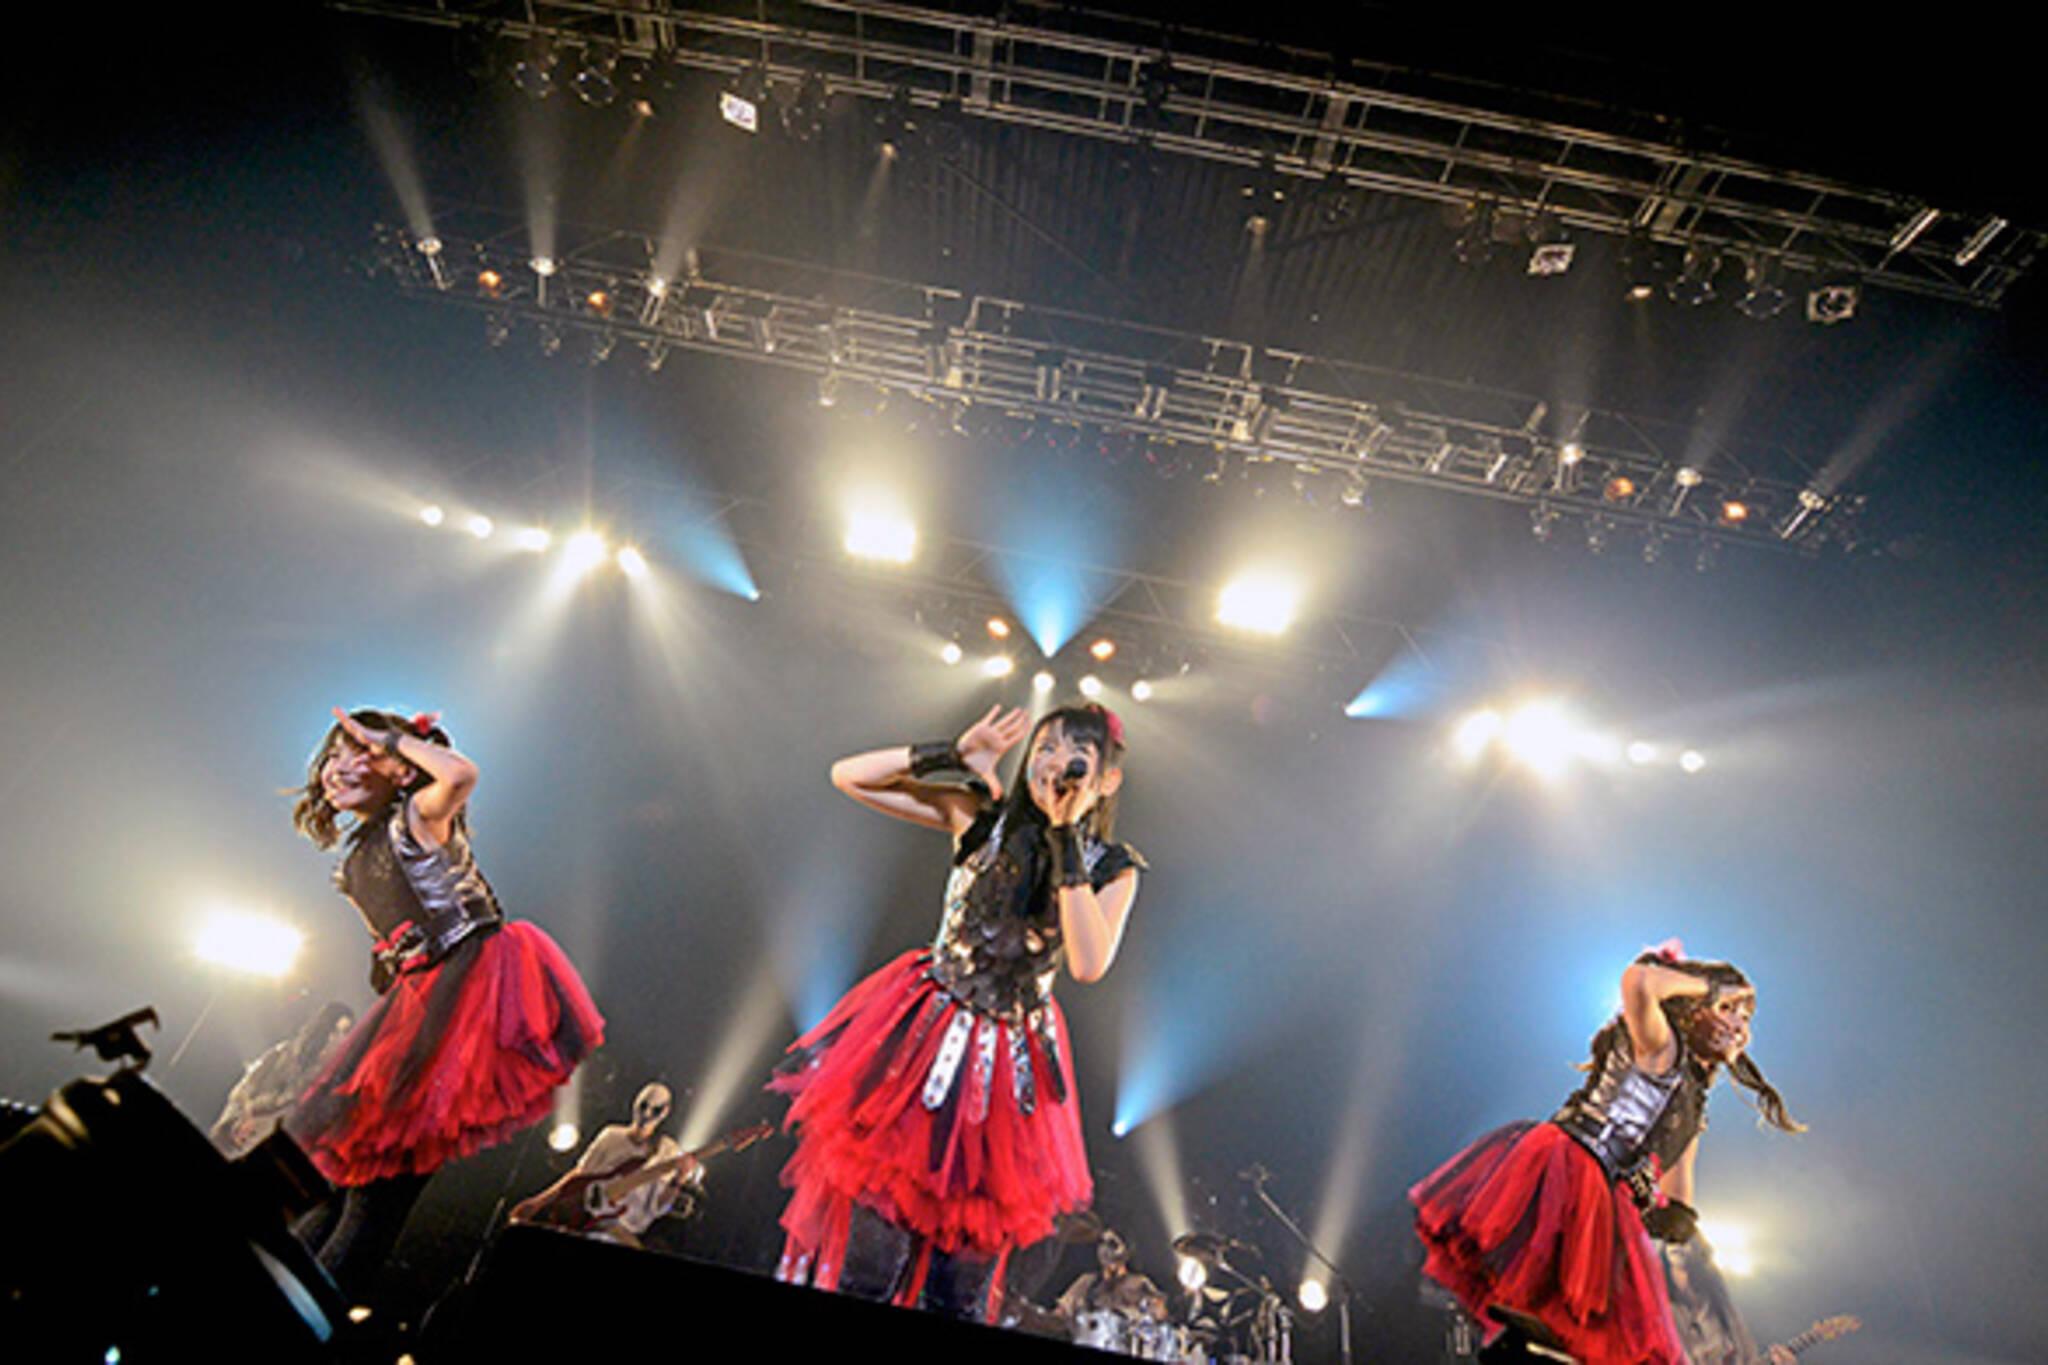 concerts toronto may